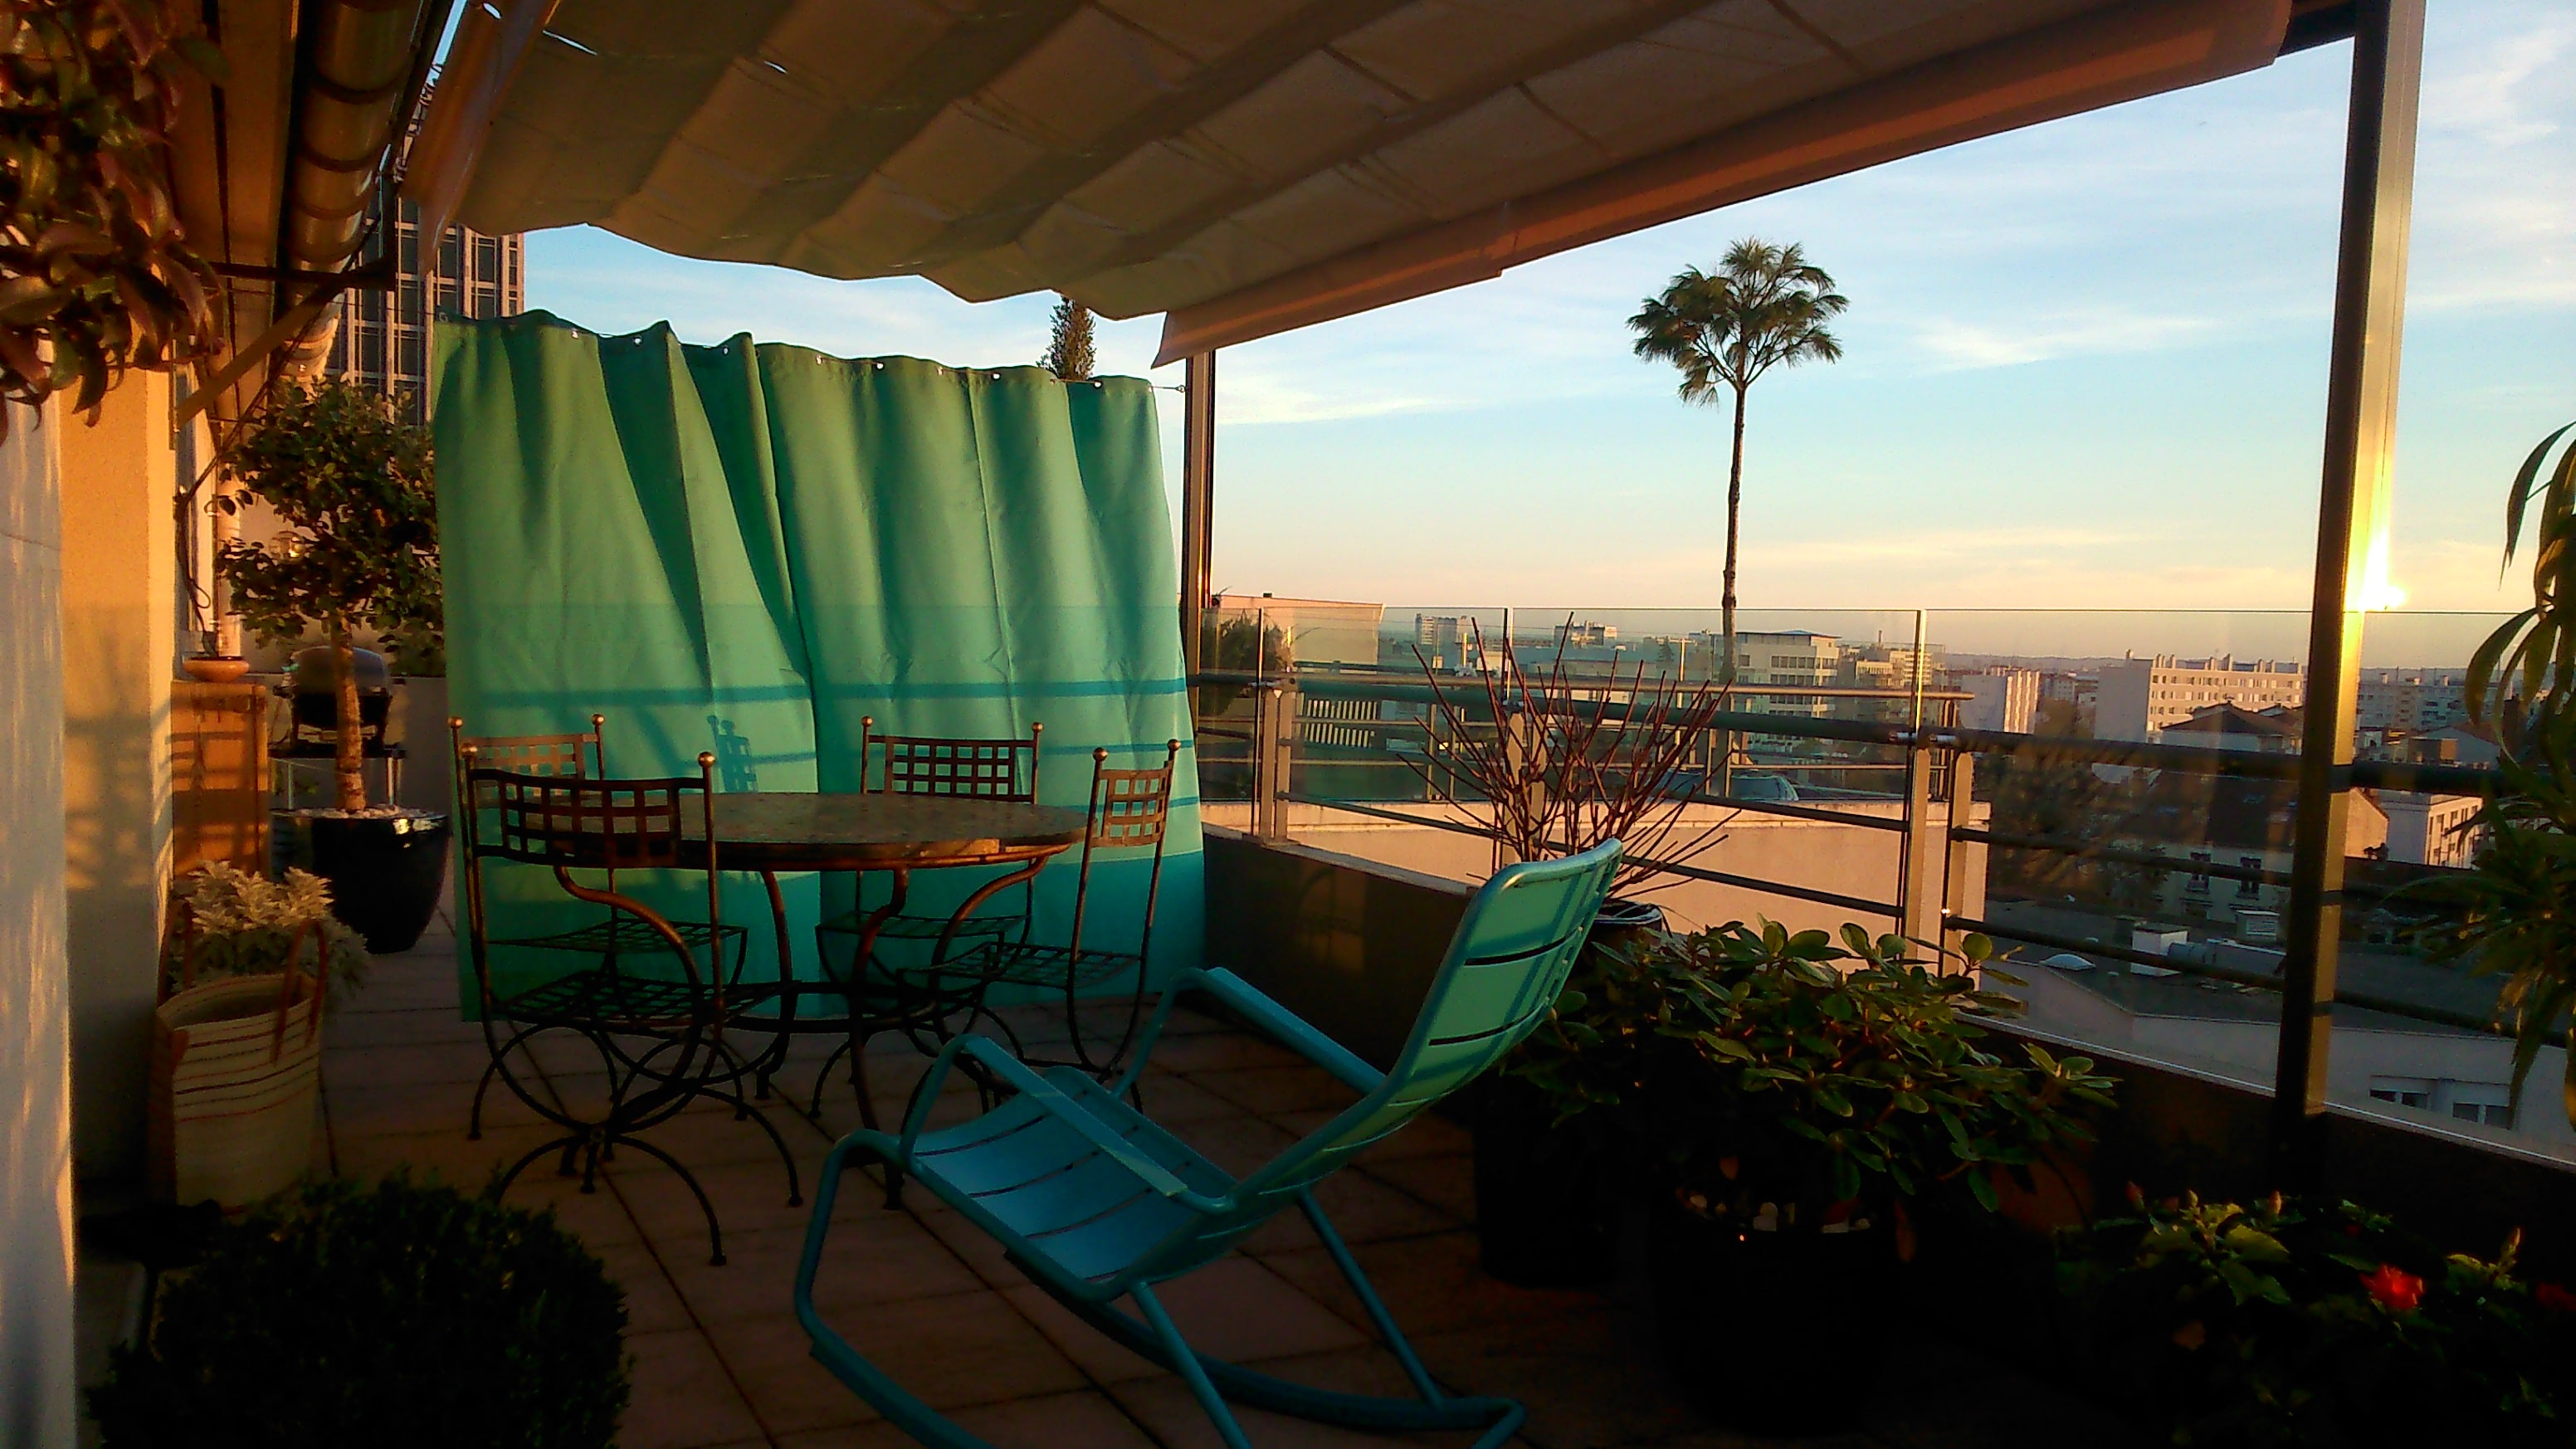 brise vue exonido pergolas sur mesure am nagement de terrasse. Black Bedroom Furniture Sets. Home Design Ideas